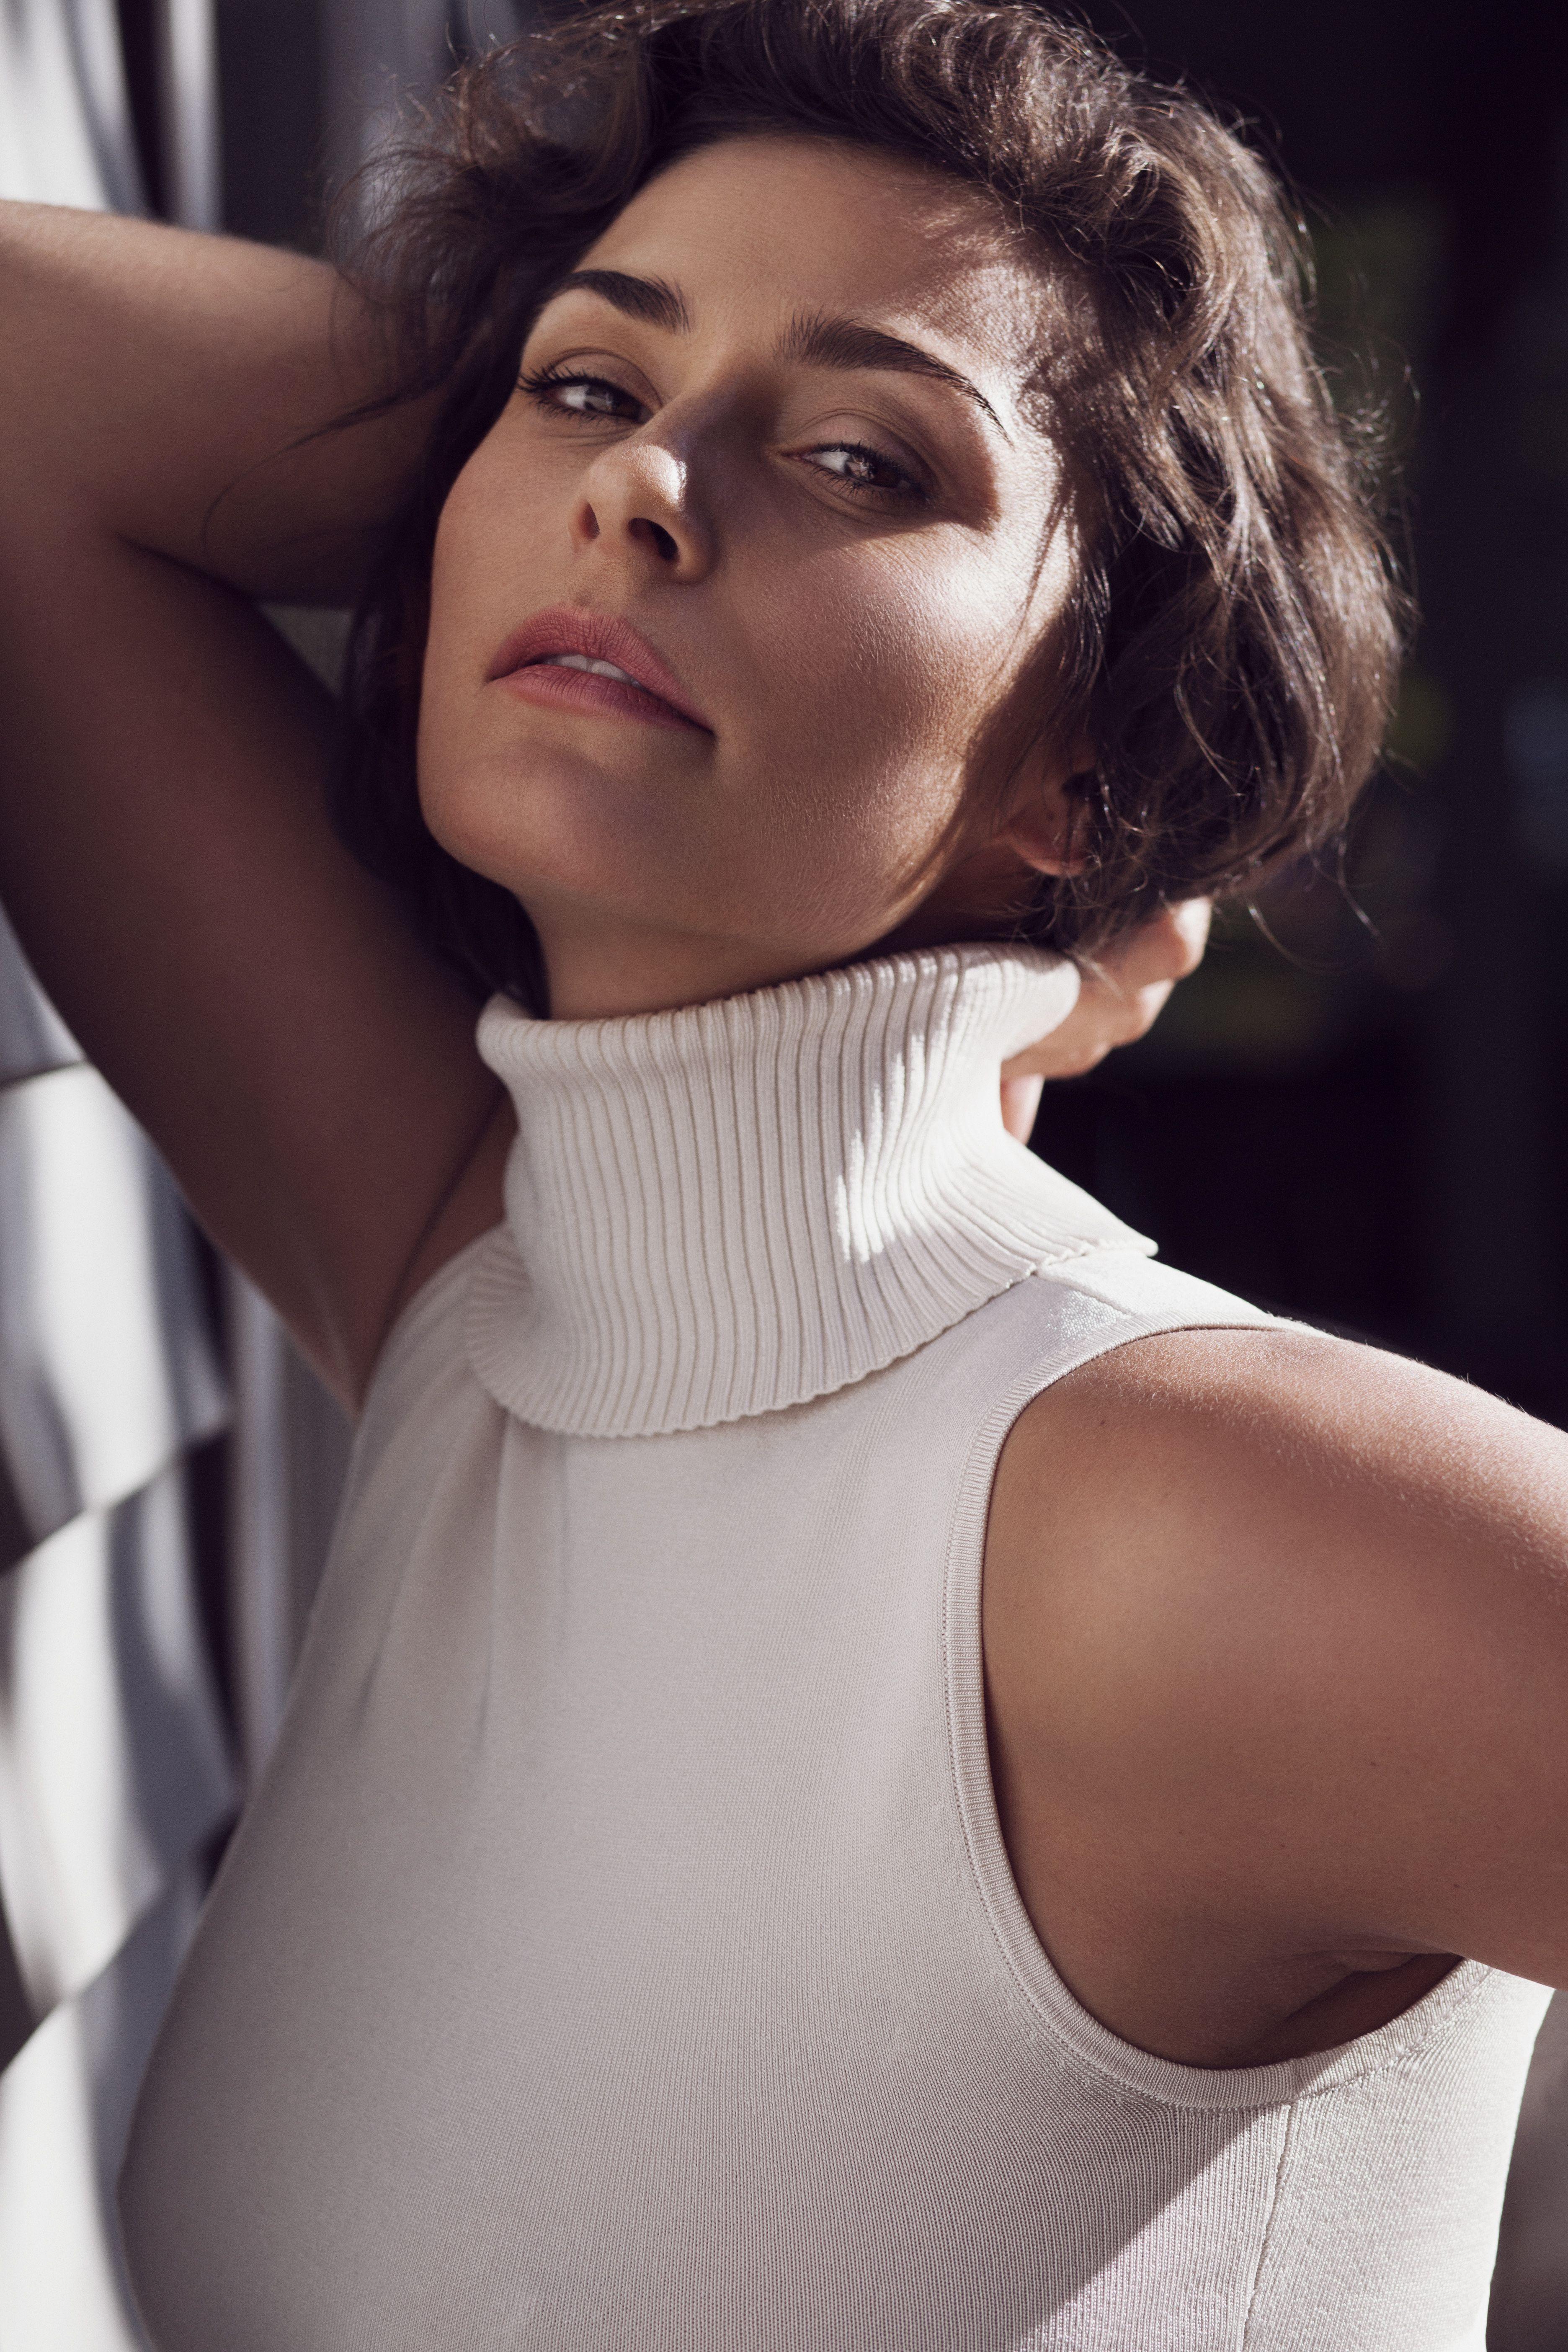 Pics Daisy Hofstetter nude photos 2019